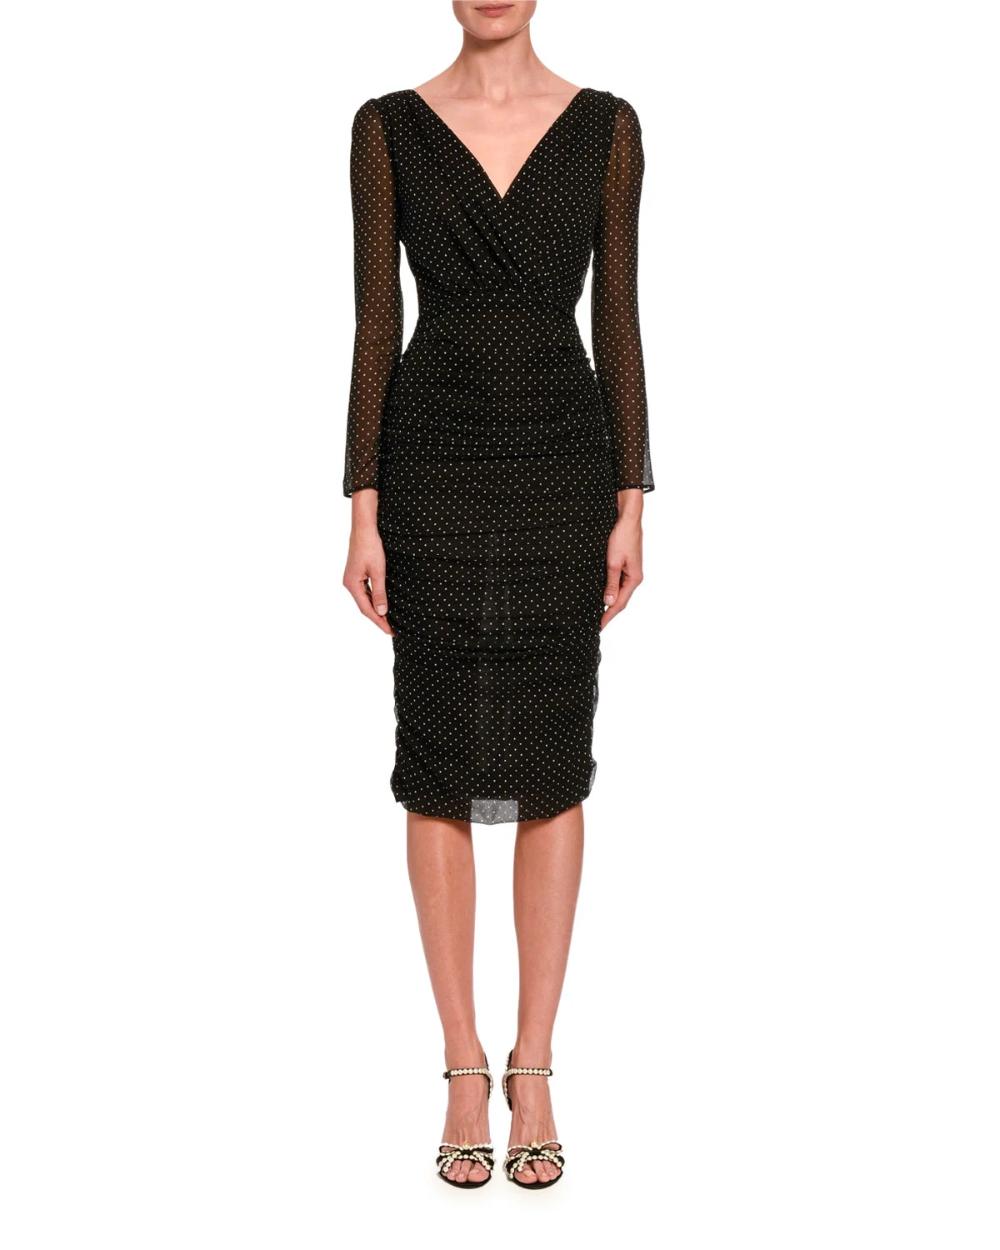 Dolce Gabbana Ruched Mesh Long Sleeve Midi Dress Long Sleeve Midi Dress Black Long Sleeve Midi Dress Long Sleeve Midi [ 1250 x 1000 Pixel ]